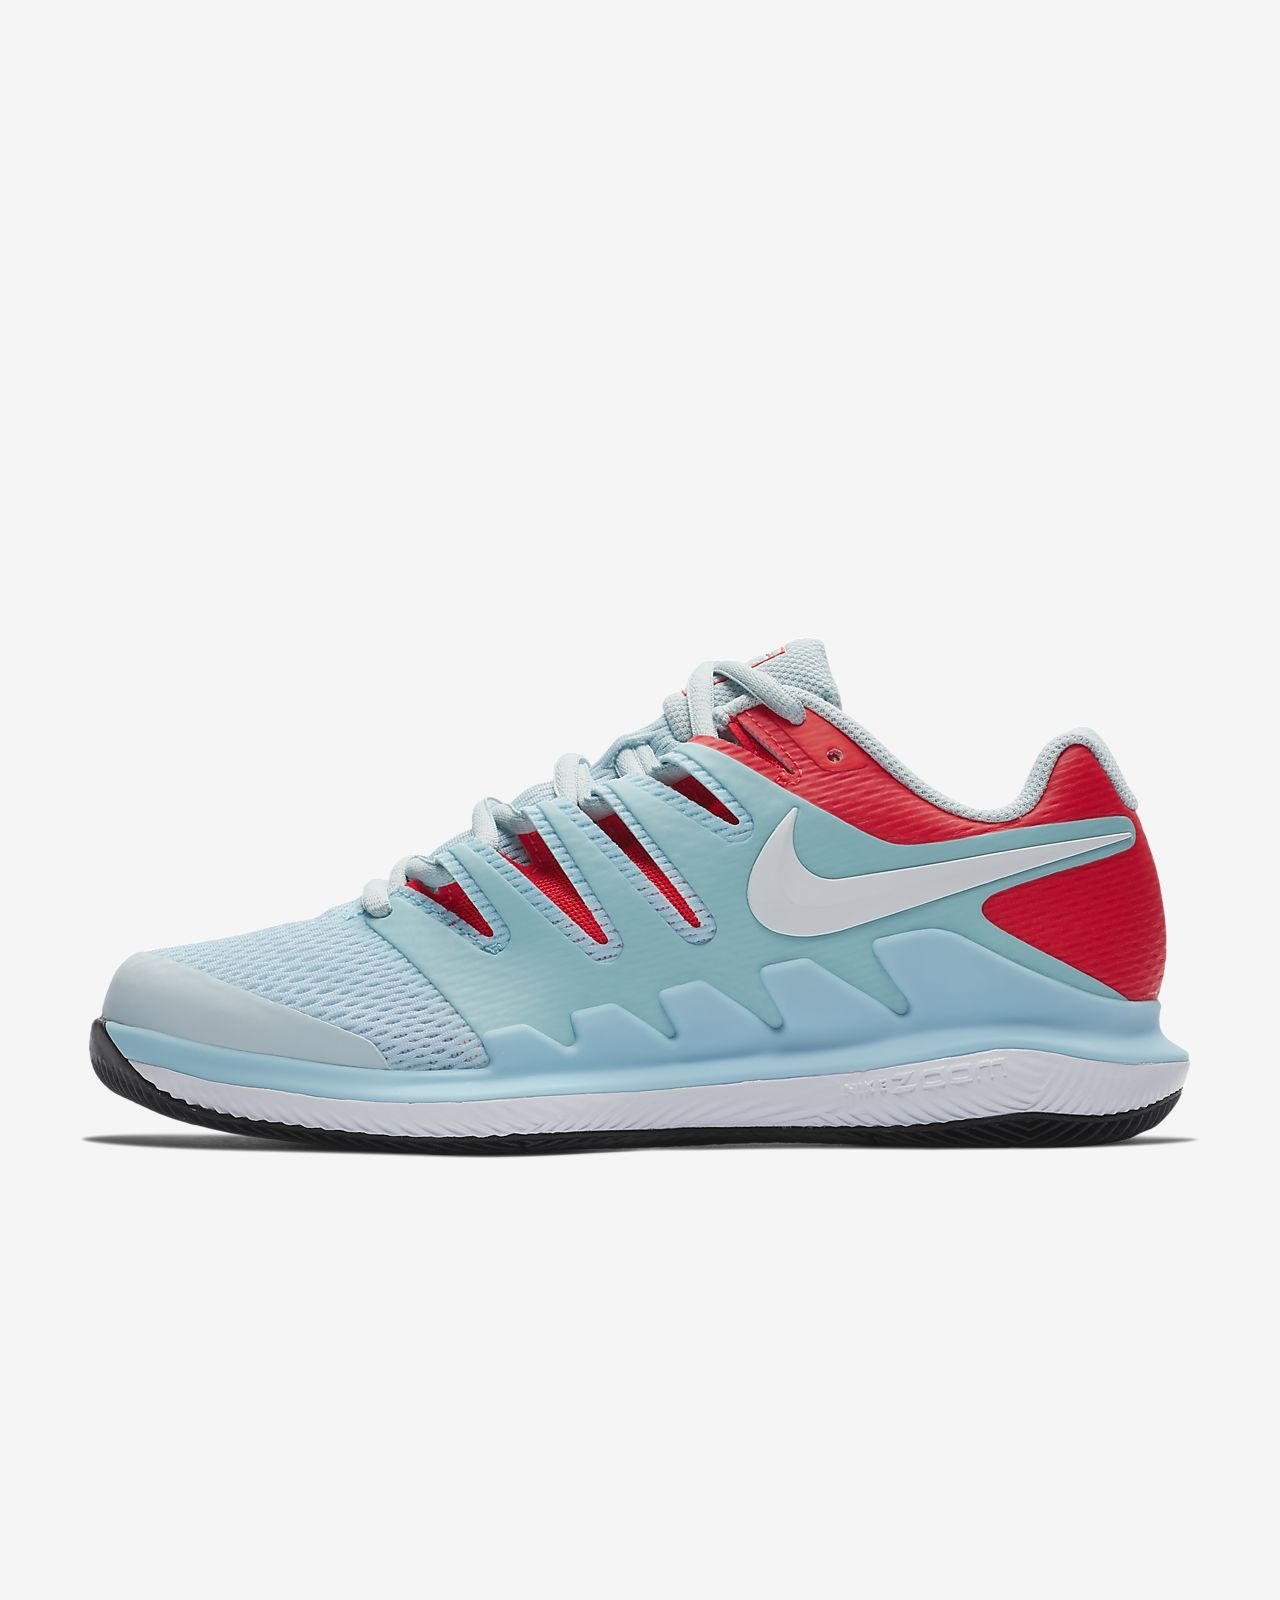 7e76ef247d5a7 NikeCourt Air Zoom Vapor X Women s Hard Court Tennis Shoe. Nike.com GB